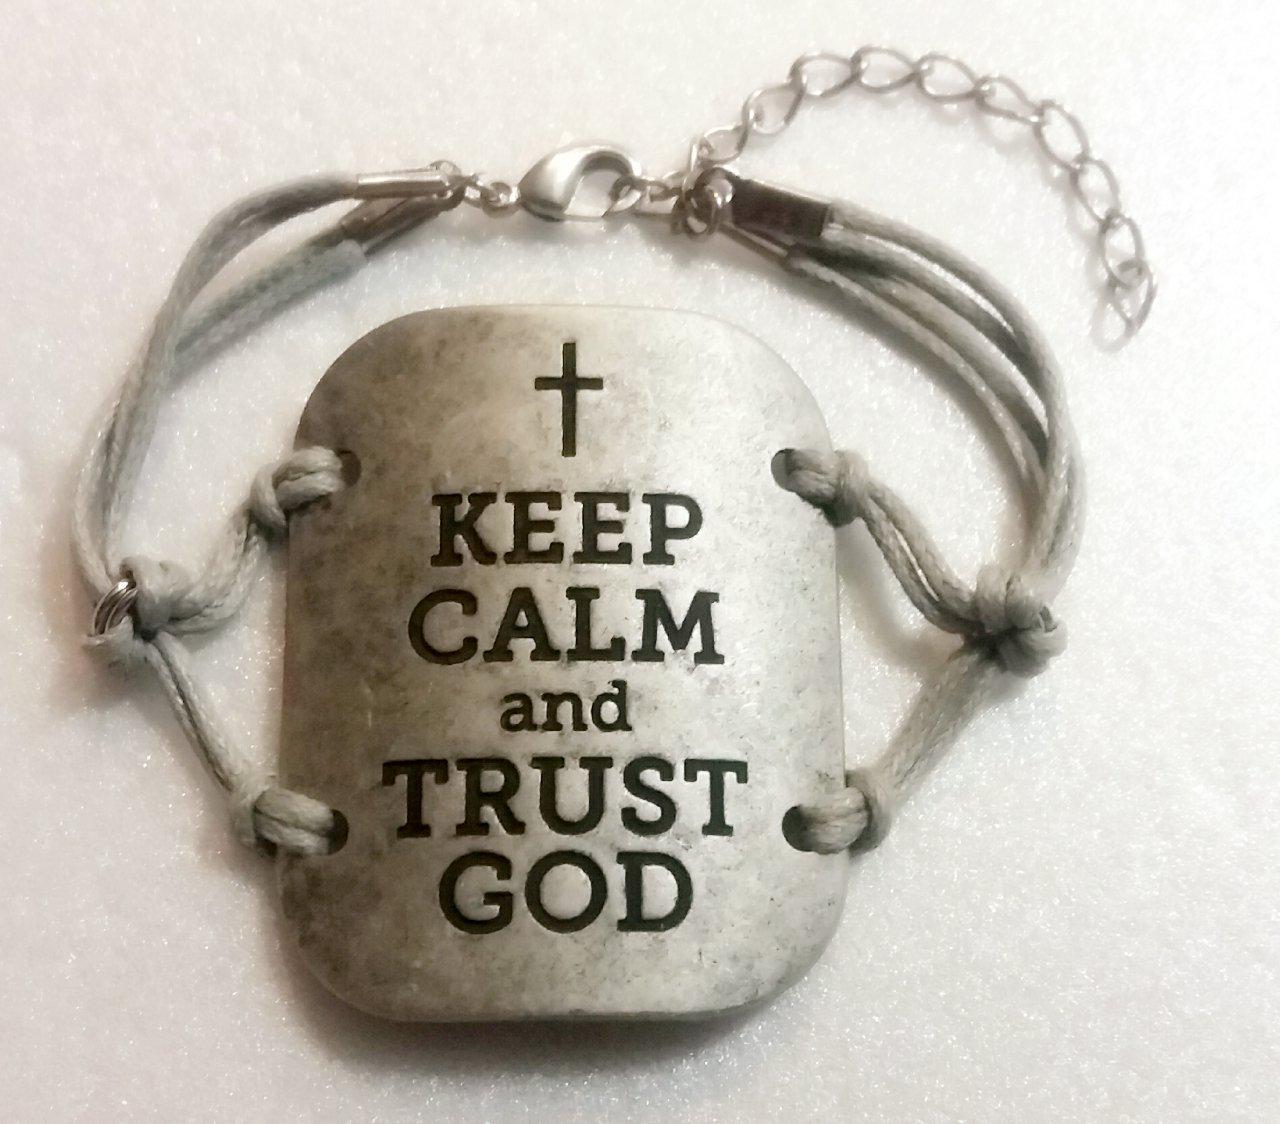 KEEP CALM AND TRUST GOD ADJUSTABLE HANDMADE BRACELET (GREY)